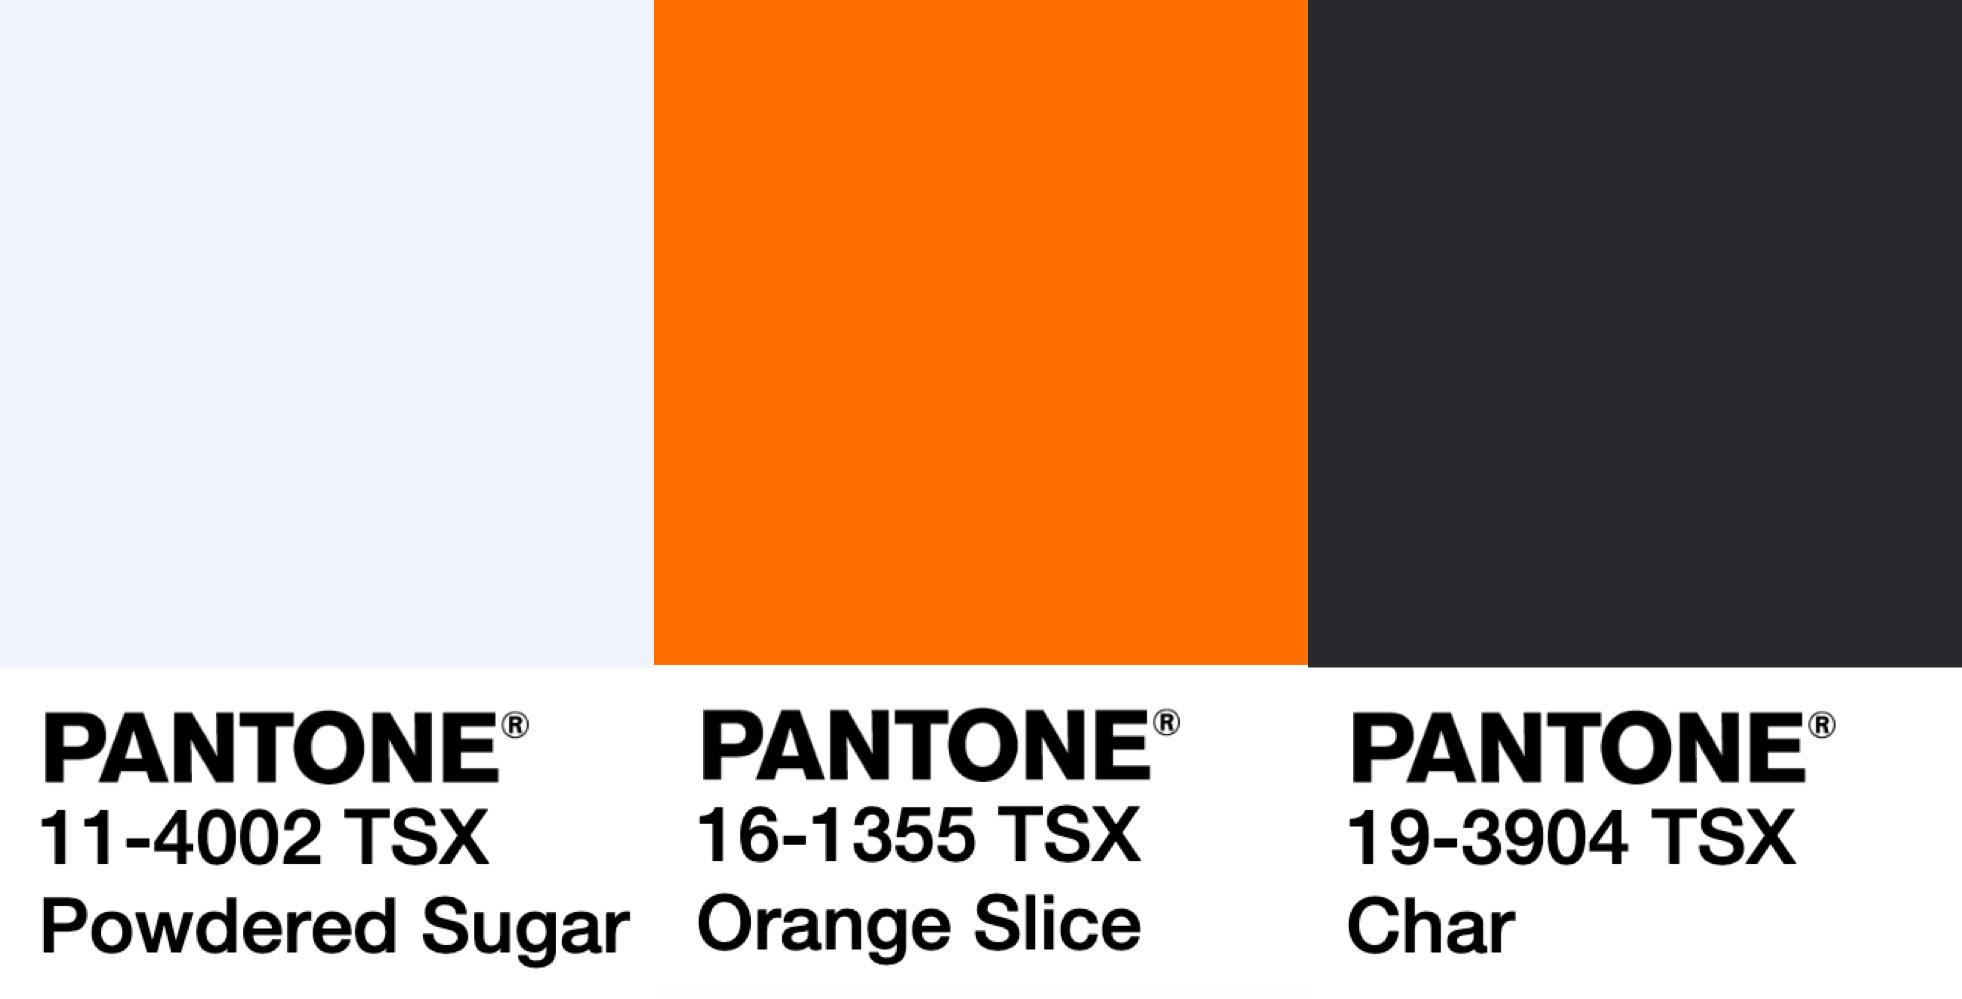 Abandoned Skate OS V. 1.1 - PANTONE 19-3904 TSX CharPANTONE 16-1355 TSX Orange SlicePANTONE 11-4002 TSX Powdered Sugar